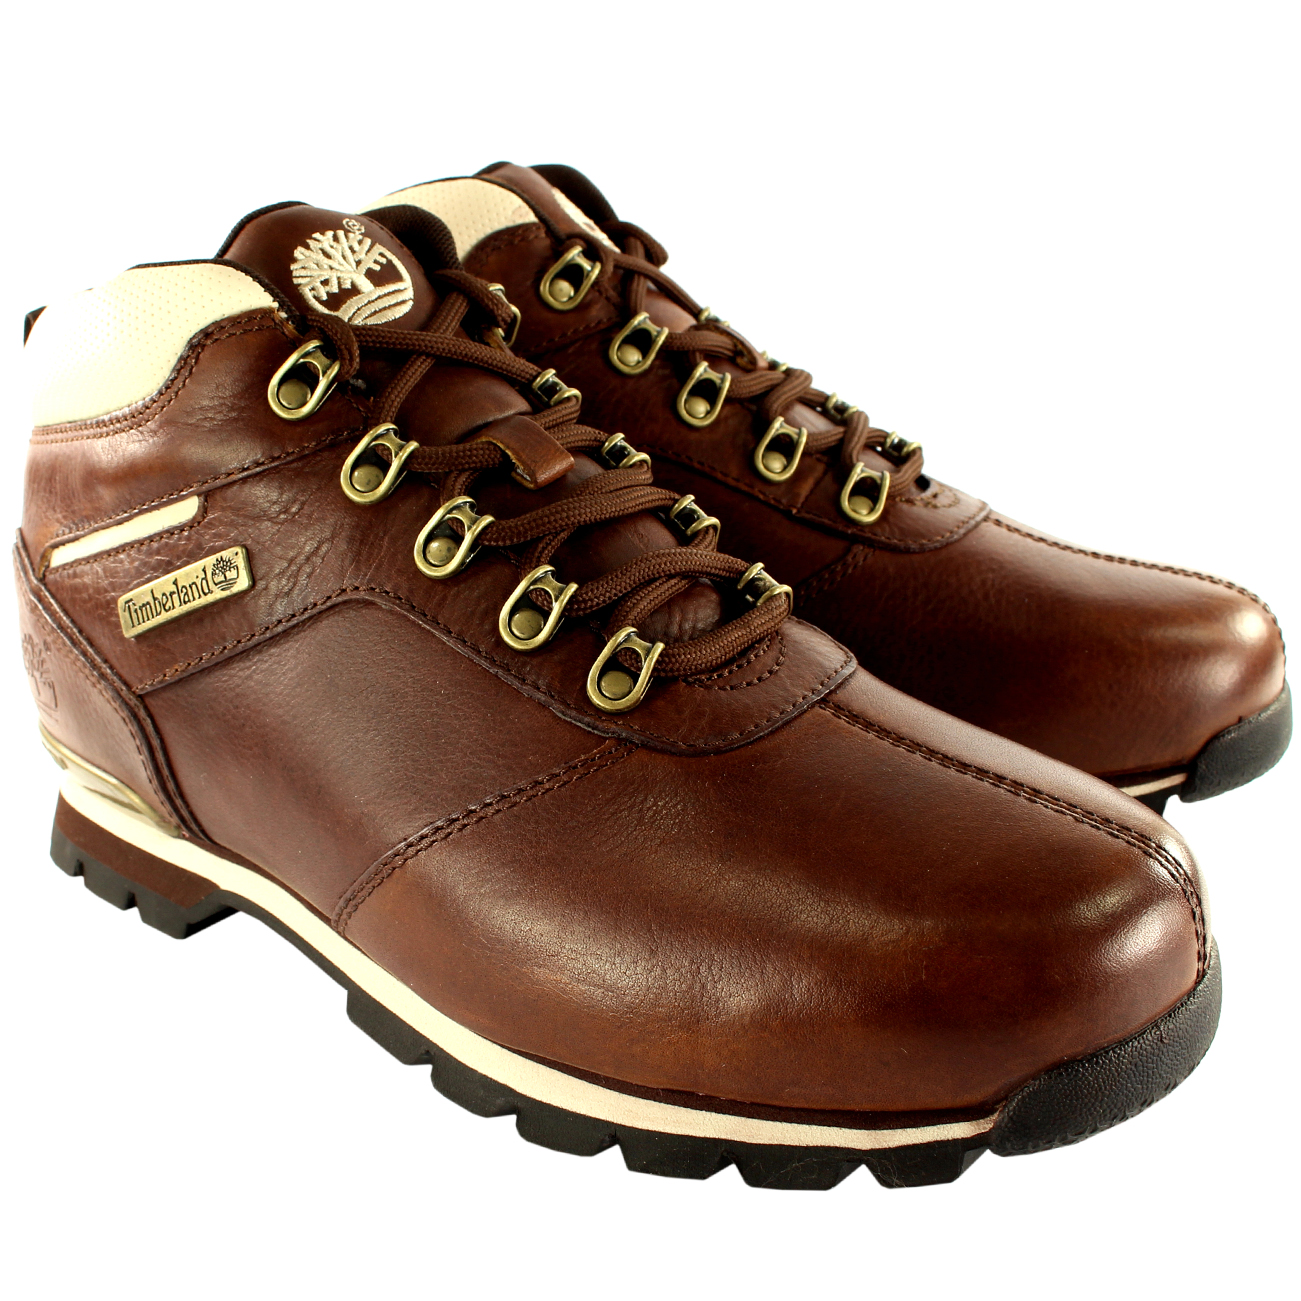 Timberland Splitrock 2 Hiker Boots